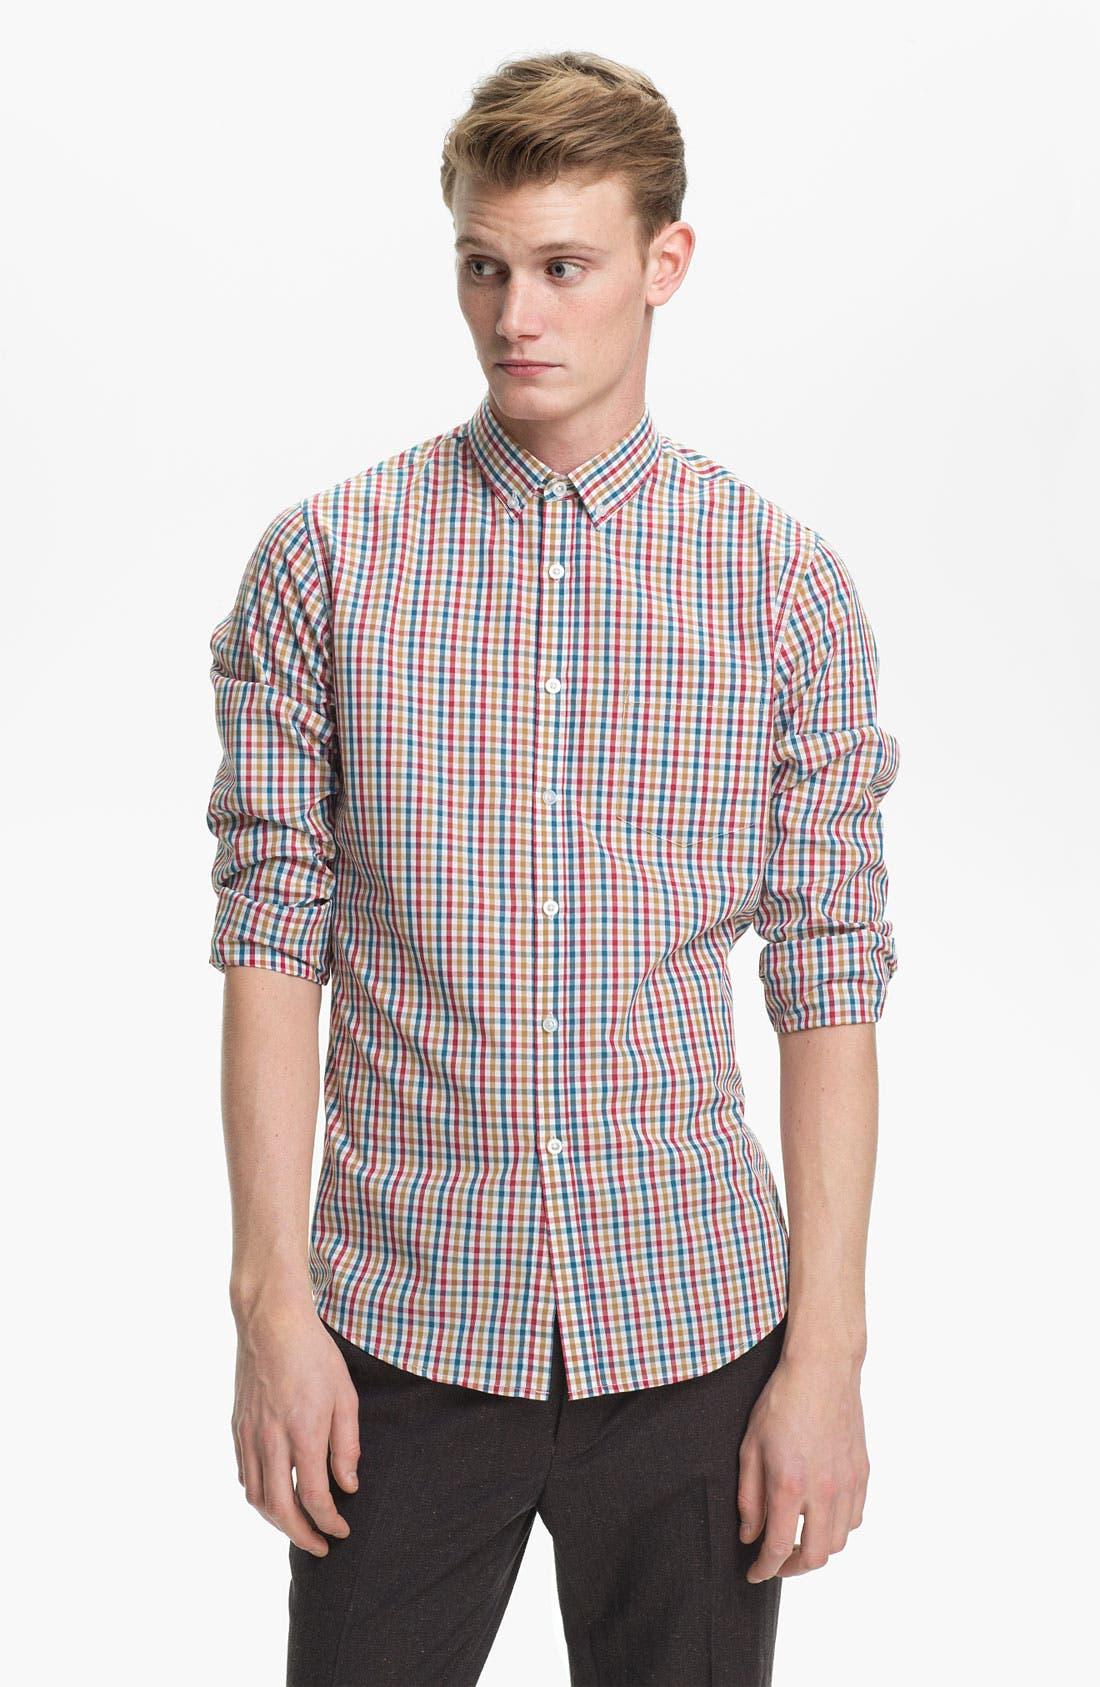 Alternate Image 1 Selected - Topman Gingham Woven Shirt